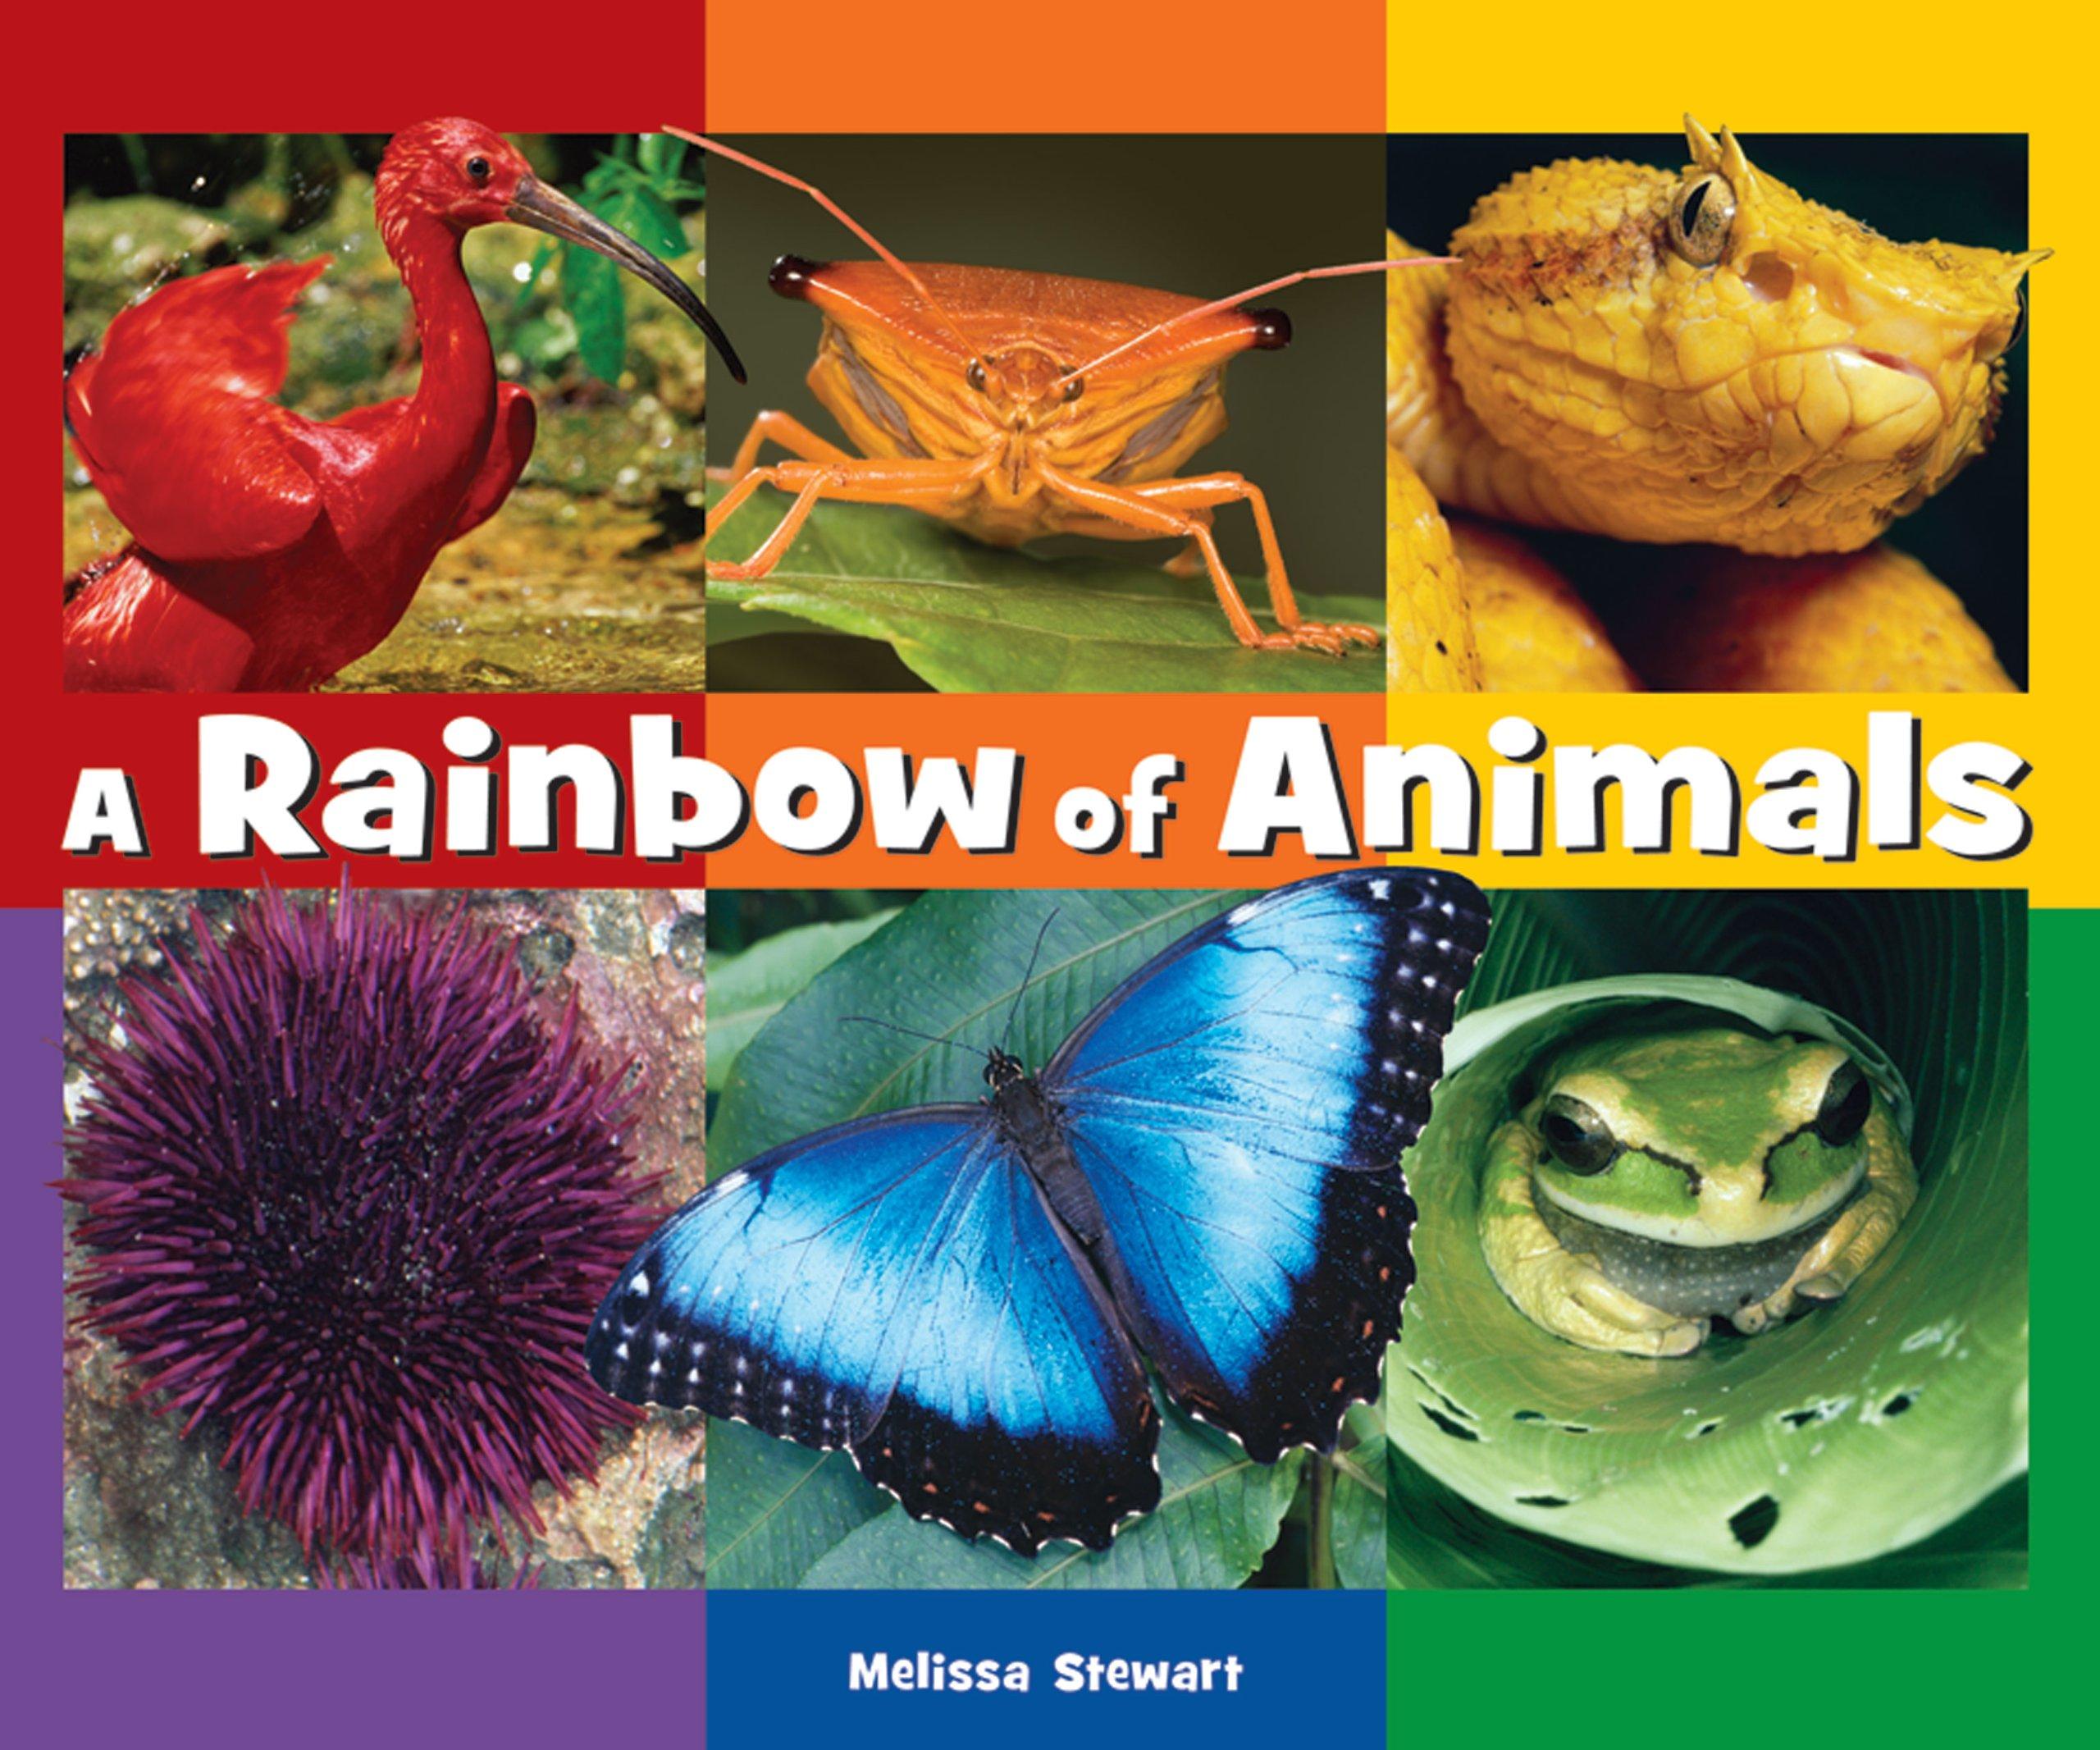 A Rainbow of Animals ebook